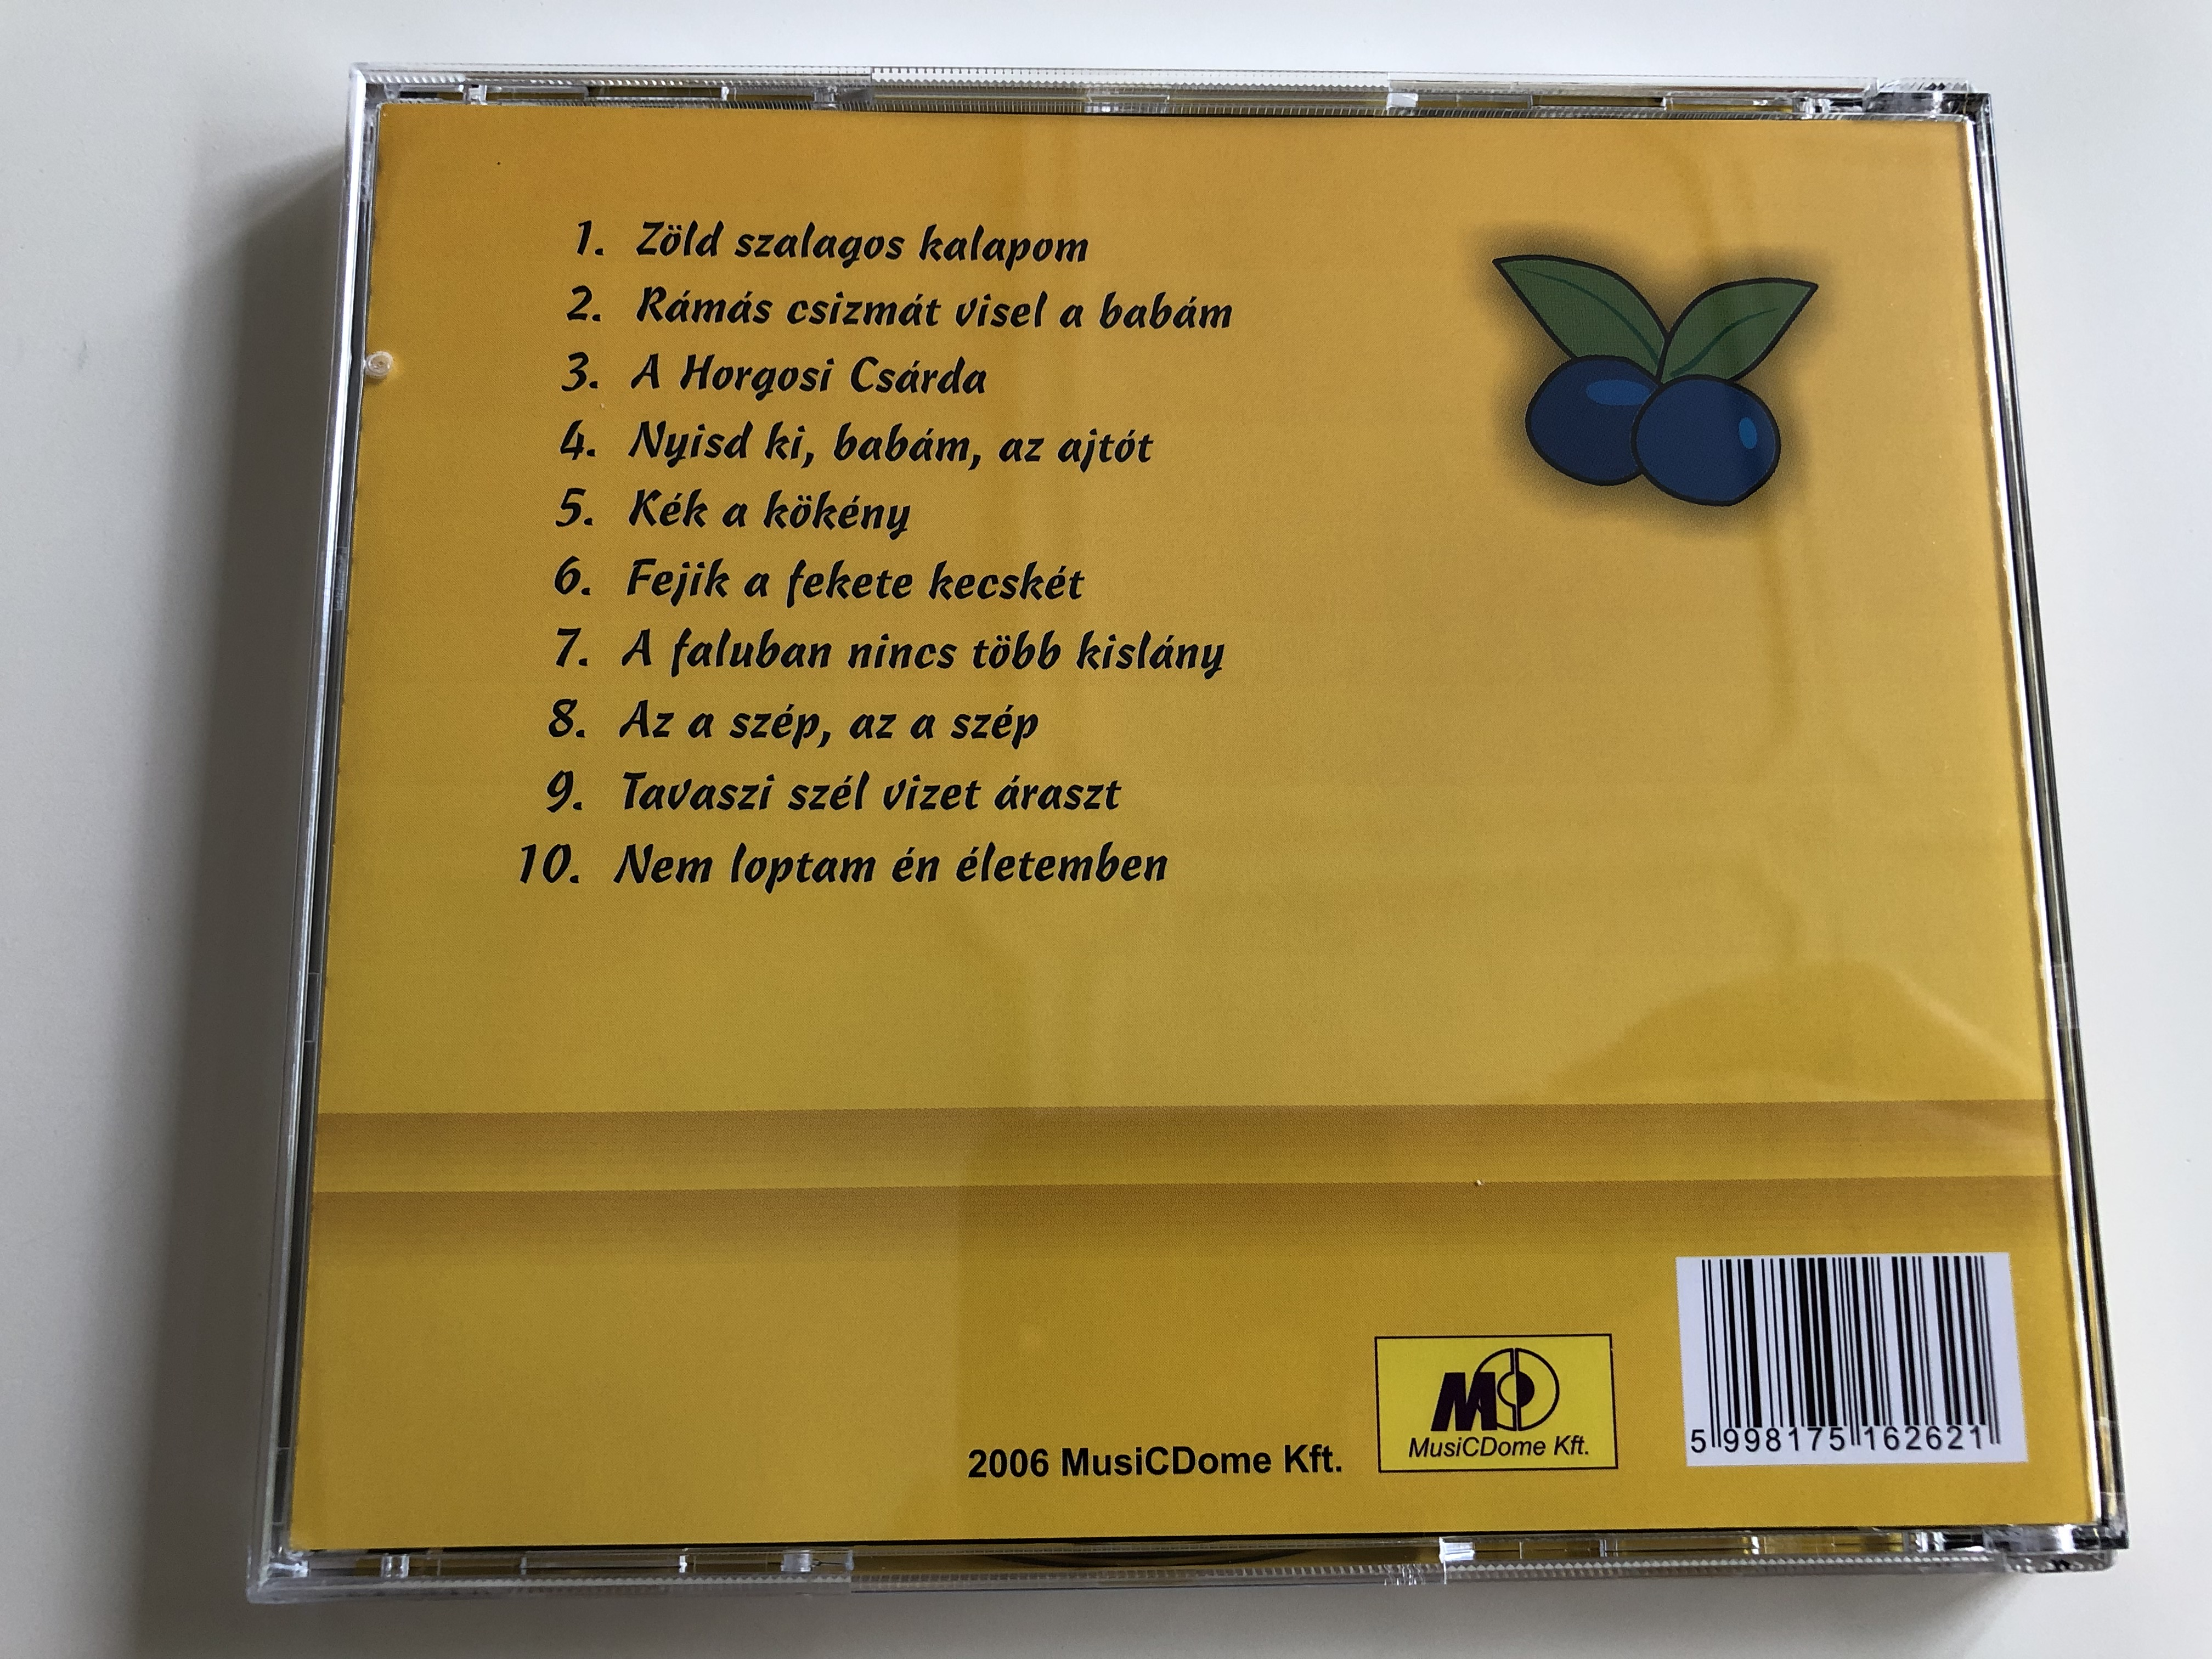 mulat-s-k-k-a-k-k-ny-n-pdalok-modern-mulat-s-k-nt-sben-z-ld-szalagos-kalapom-a-horgosi-cs-rda-a-faluban-nincs-t-bb-kisl-ny-audio-cd-2006-musicdome-0552mcd-4-.jpg